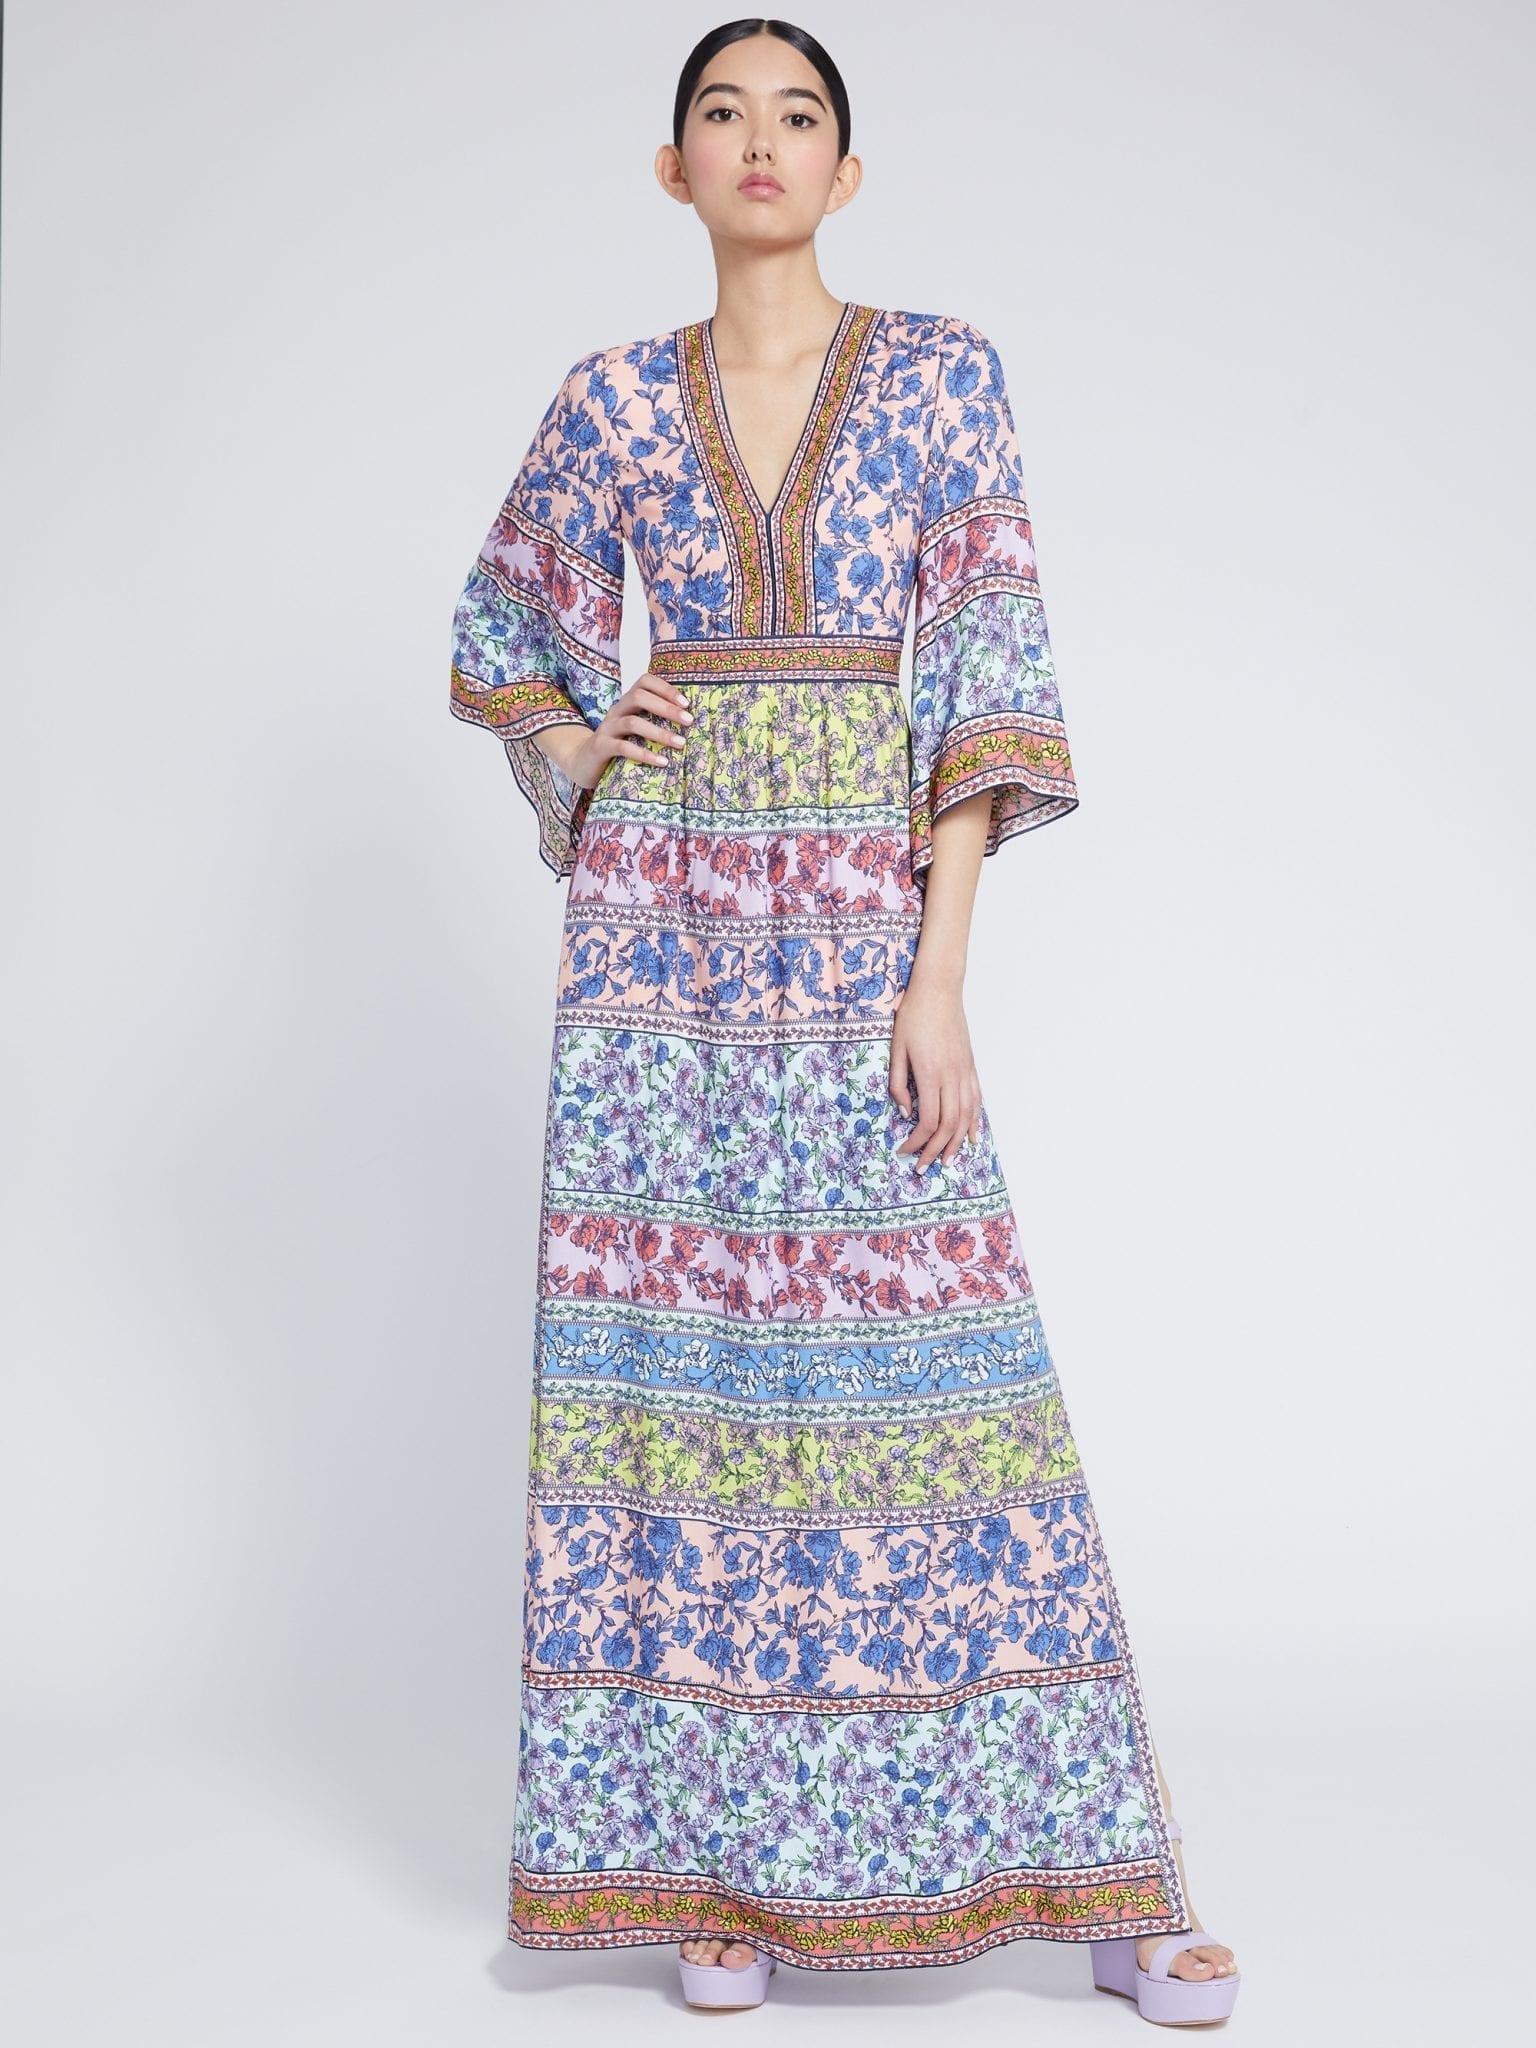 ALICE AND OLIVIA Lena Embroidered Kimono Dress